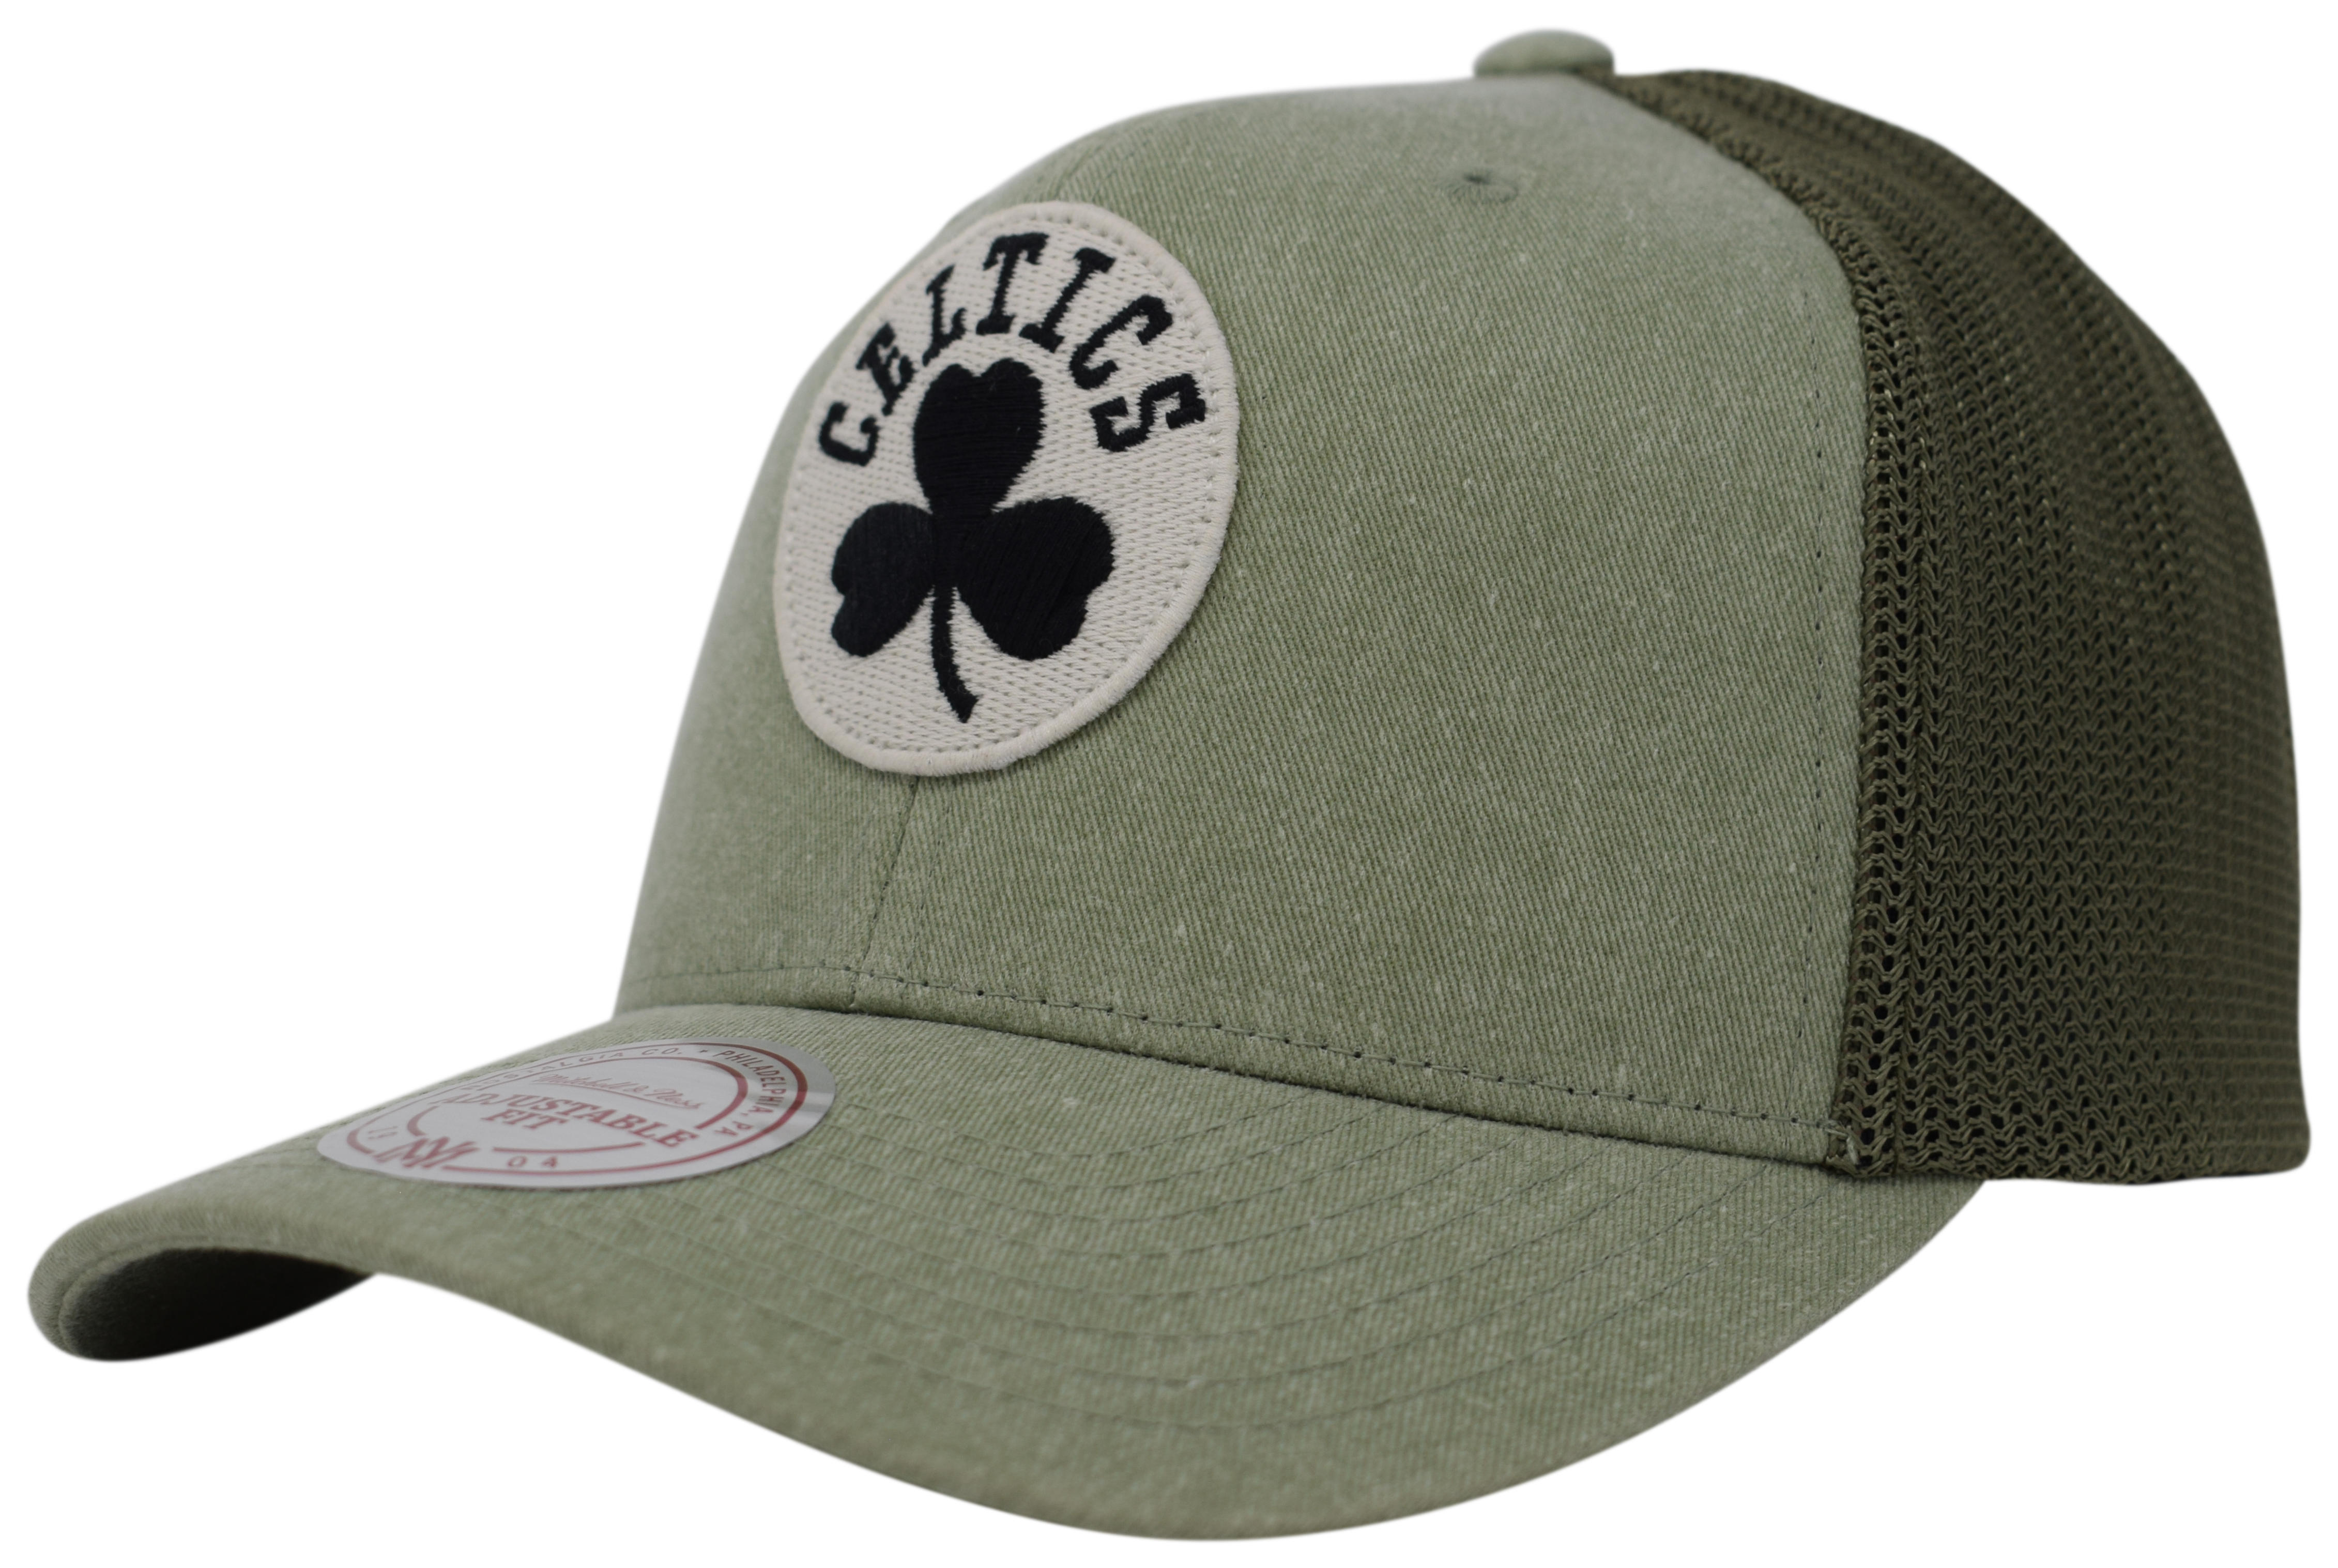 8237b55f Mitchell & Ness | Boston Celtics Olive Washout 110 Flexfit Snapback